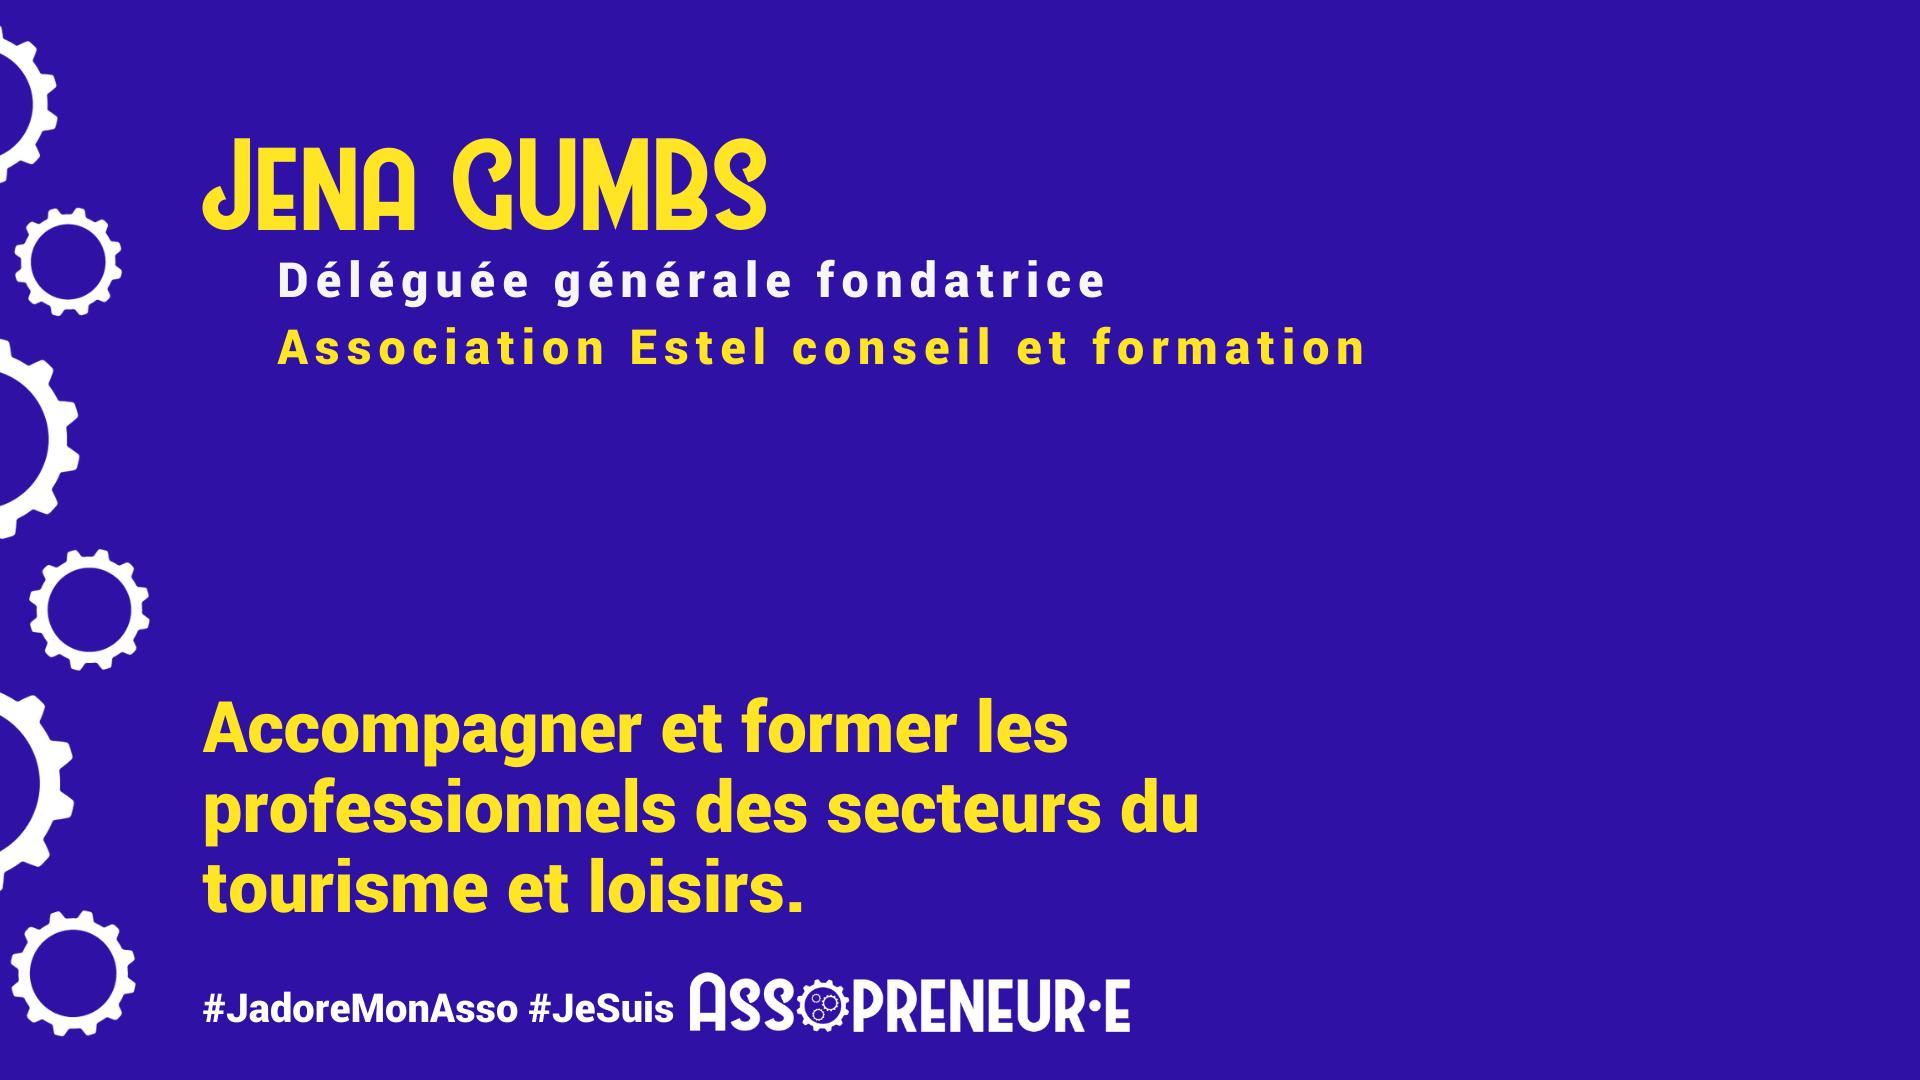 Jena GUMBS membre programme Assopreneur